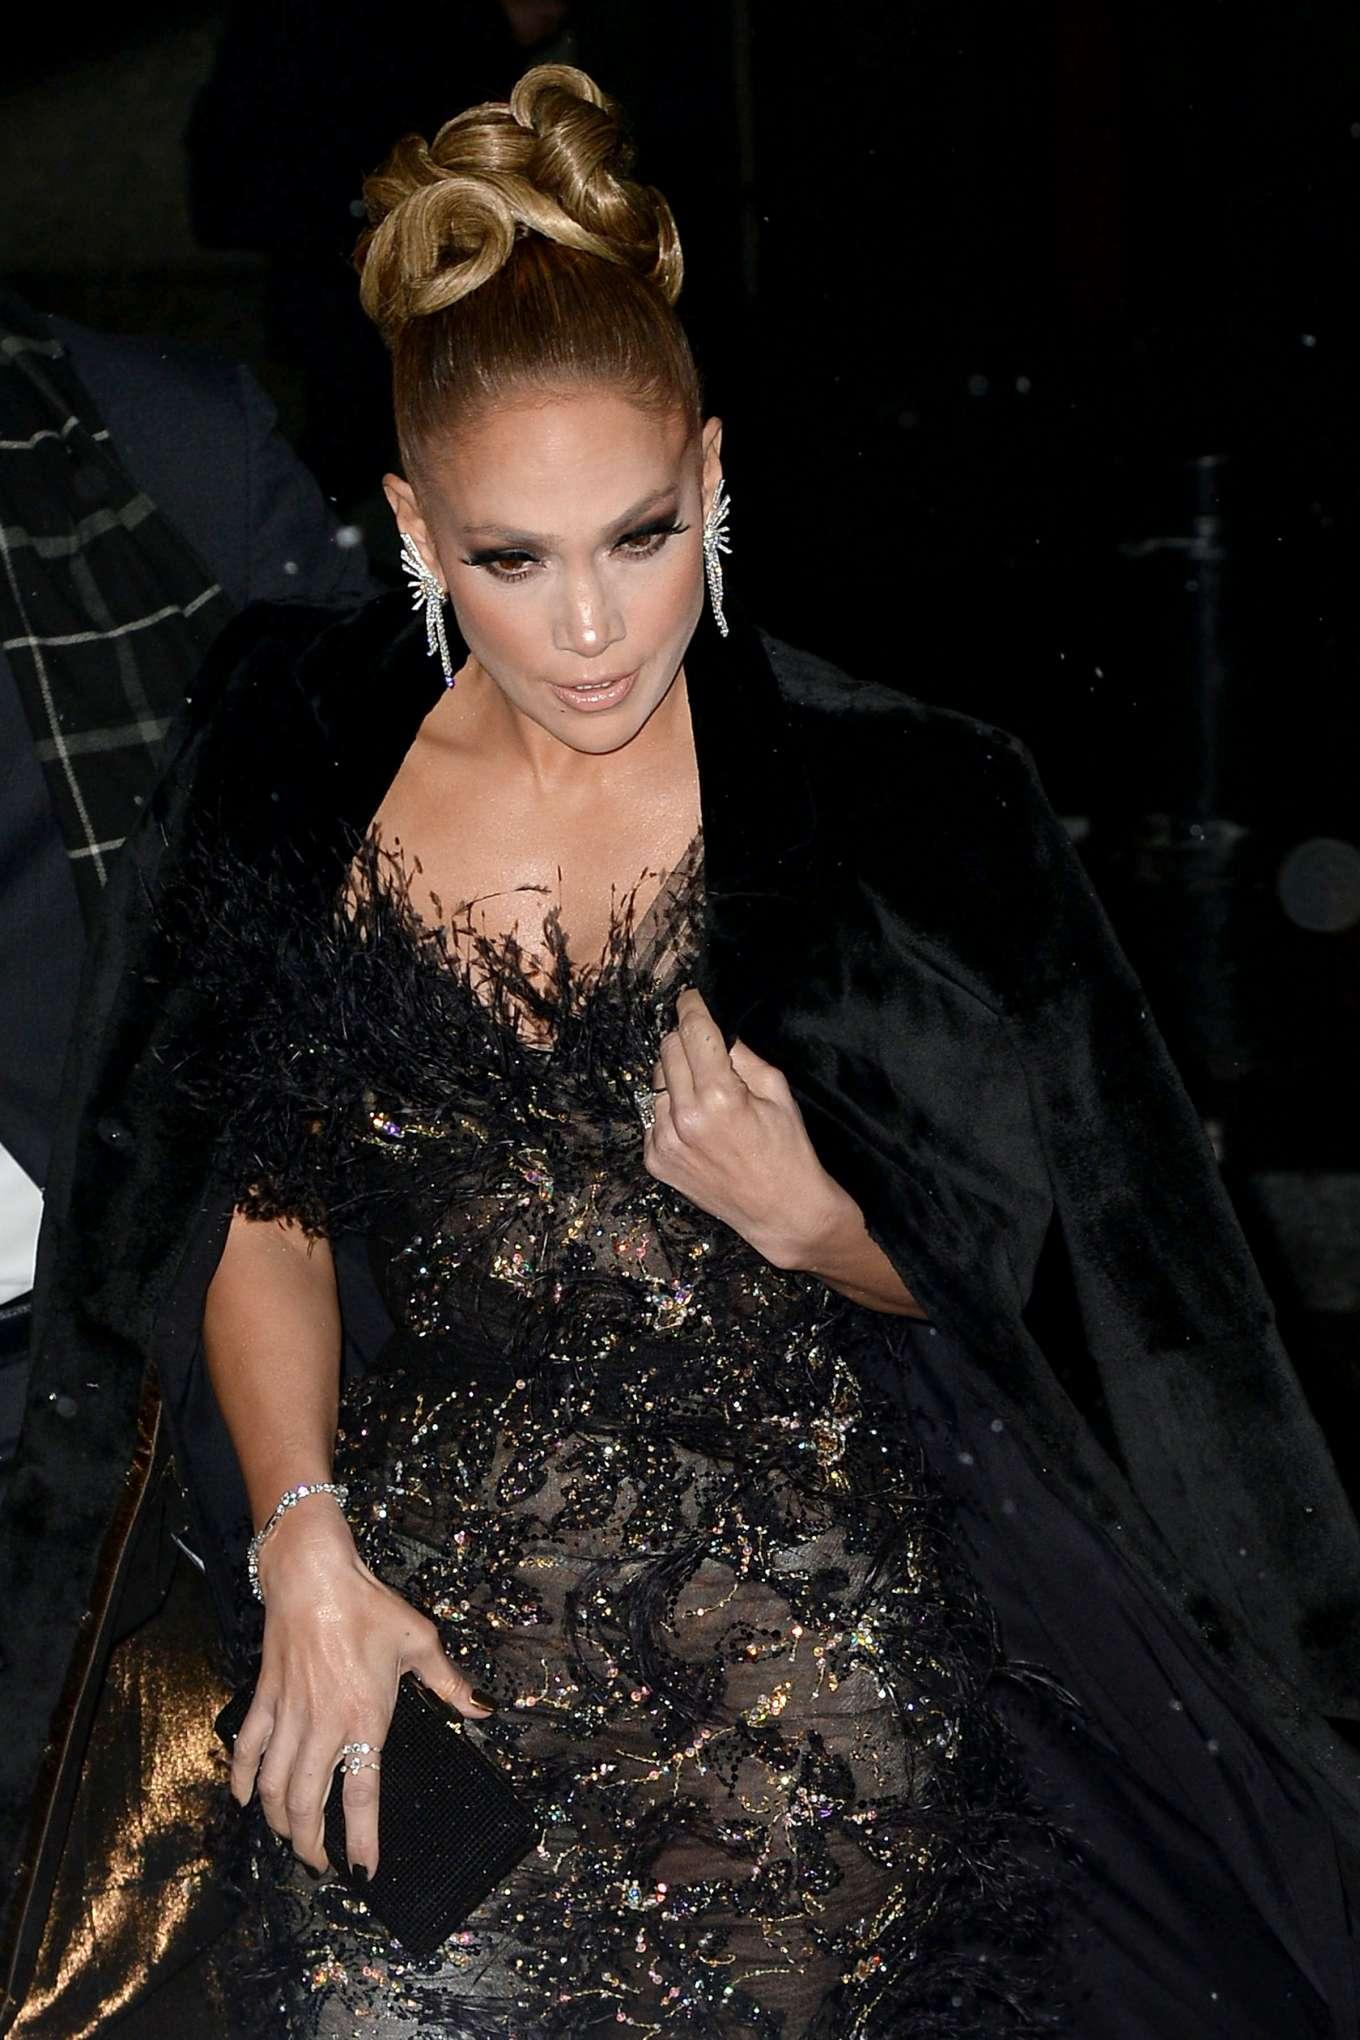 Jennifer Lopez 2019 : Jennifer Lopez – Arrives at the 29th Annual IFP Gotham Awards-10